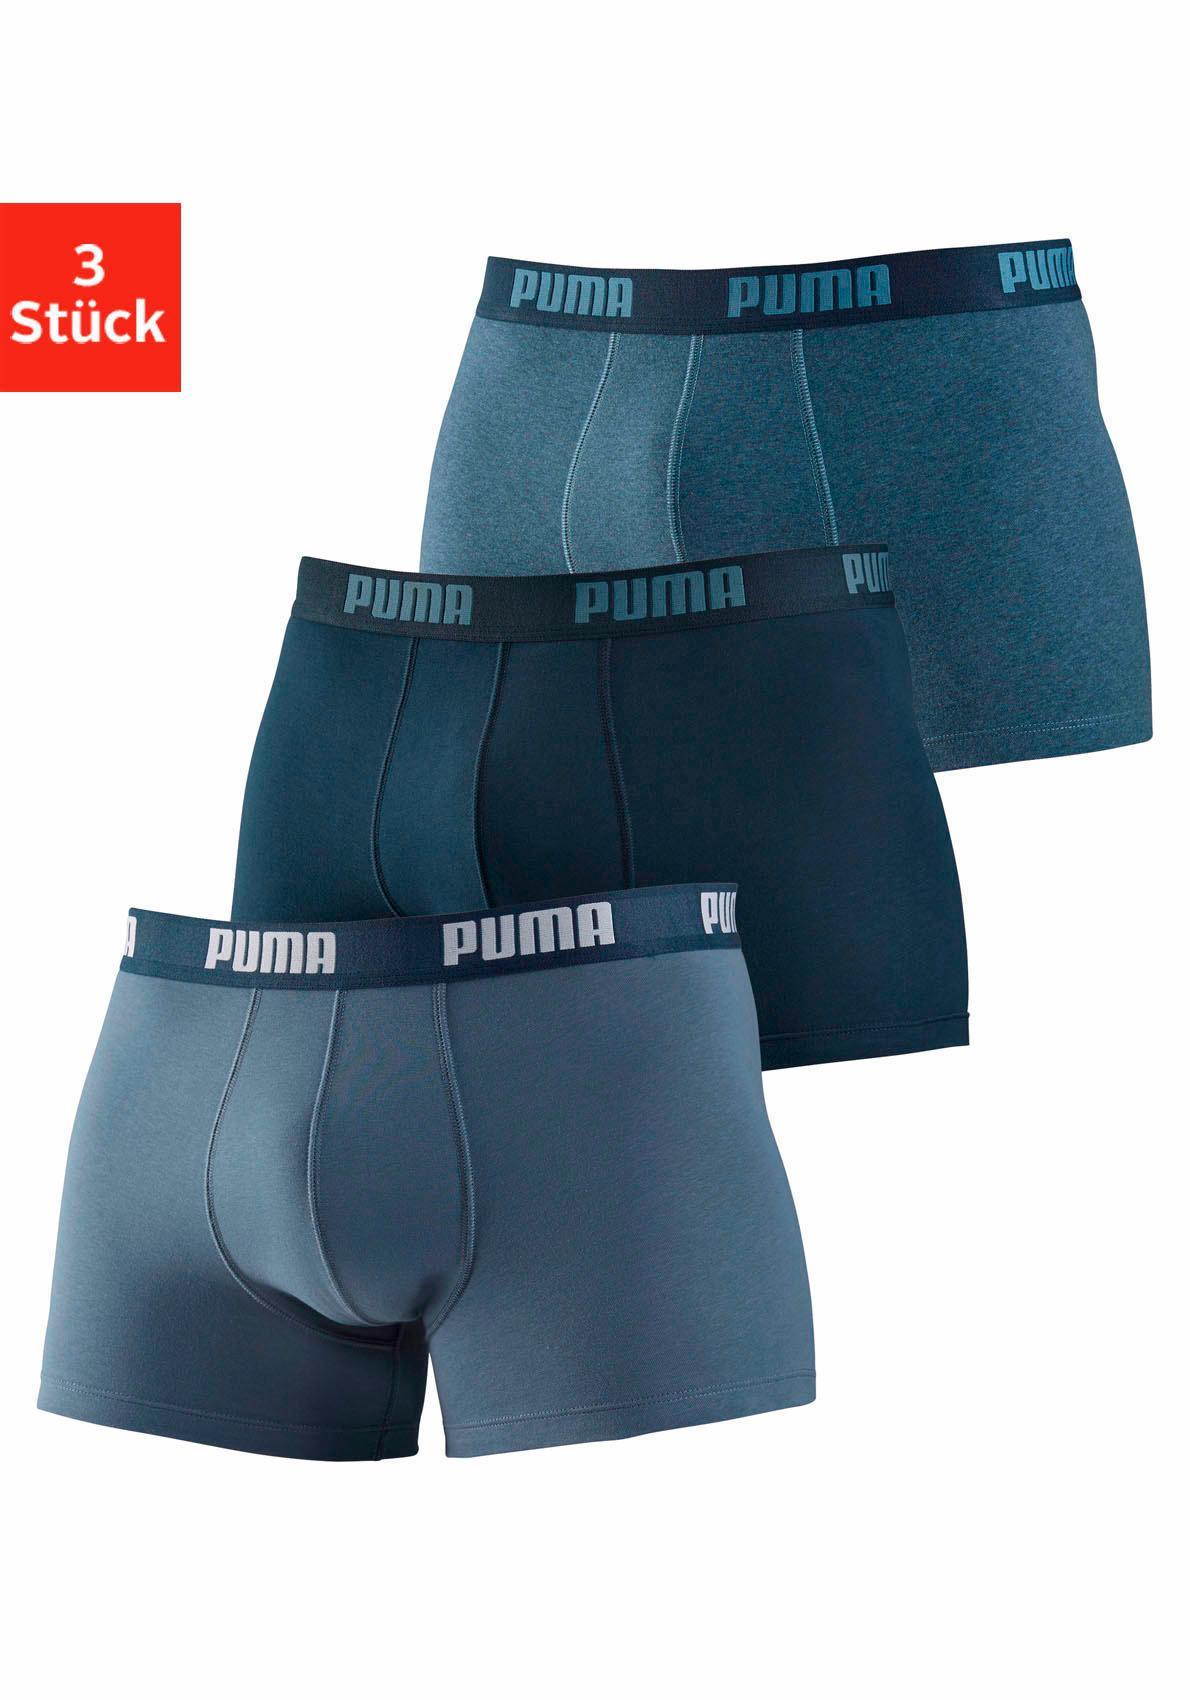 PUMA Boxer (3 Stück) in 3 Blautönen